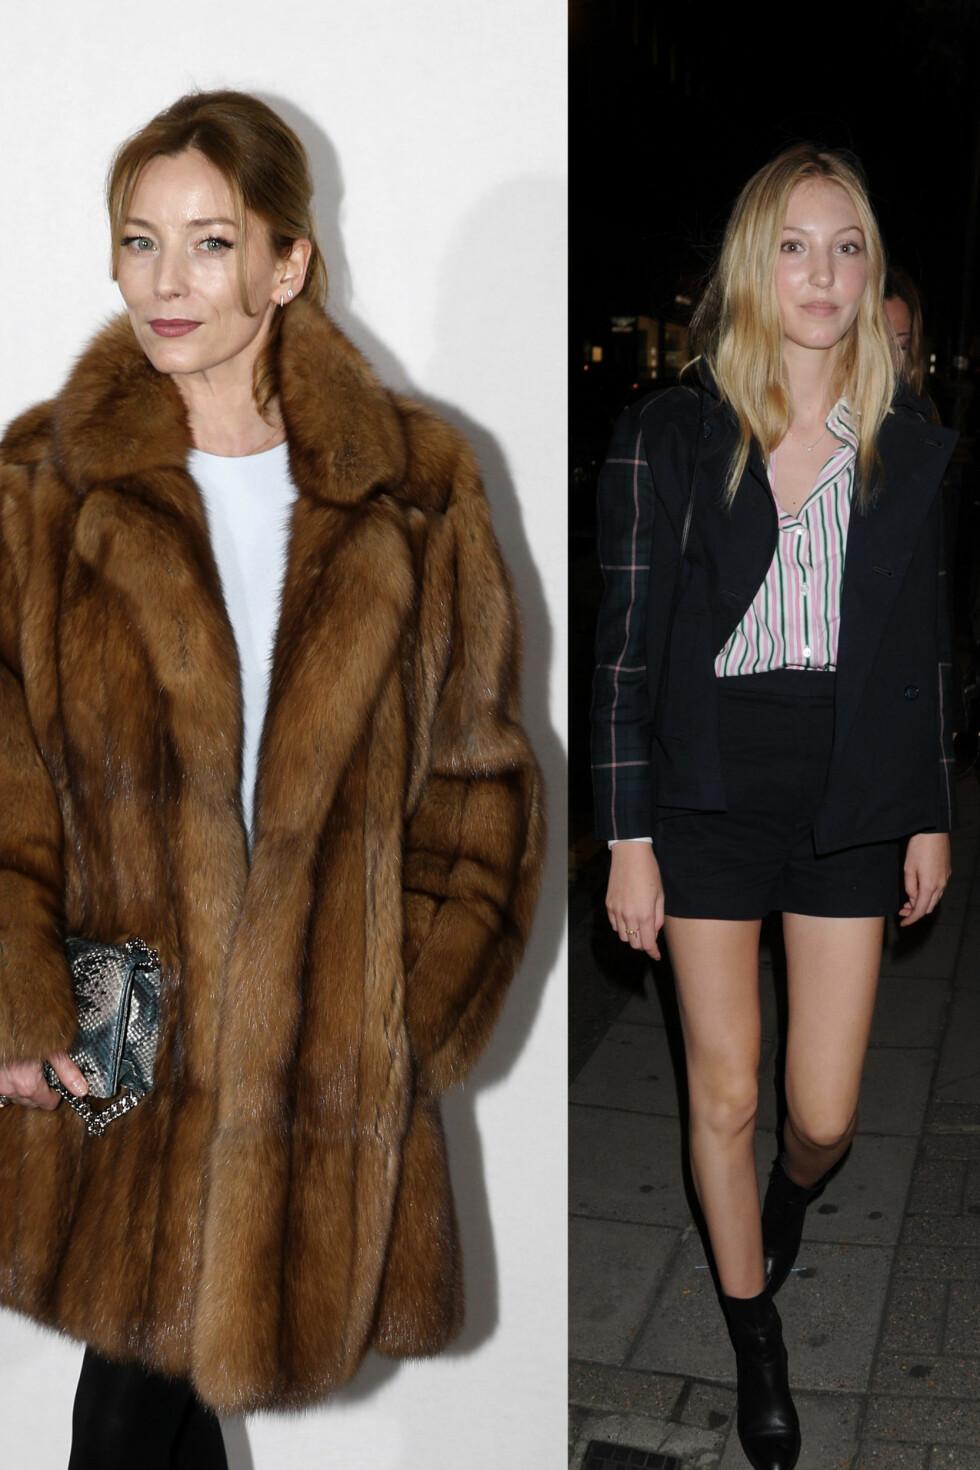 ELLA: Ella Richards (venstre) er datter av Lucie De La Falaise. Ella har allerede gått i moteshow til blant annet Prada og Valentino. Foto: NTB scanpix